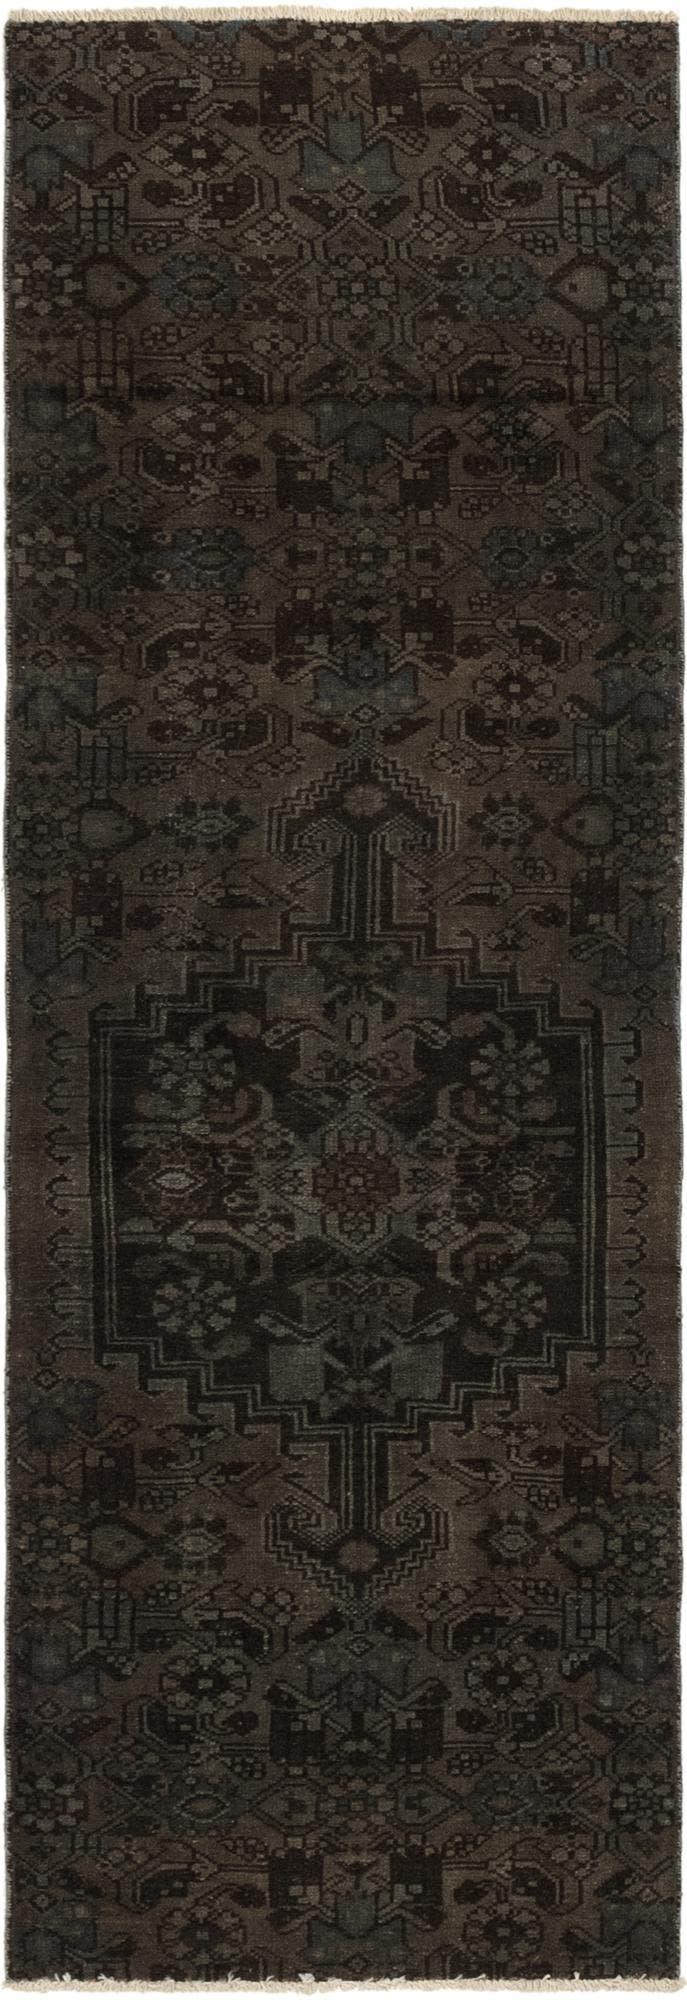 2' 5 x 7' 6 Ultra Vintage Persian Runner Rug main image